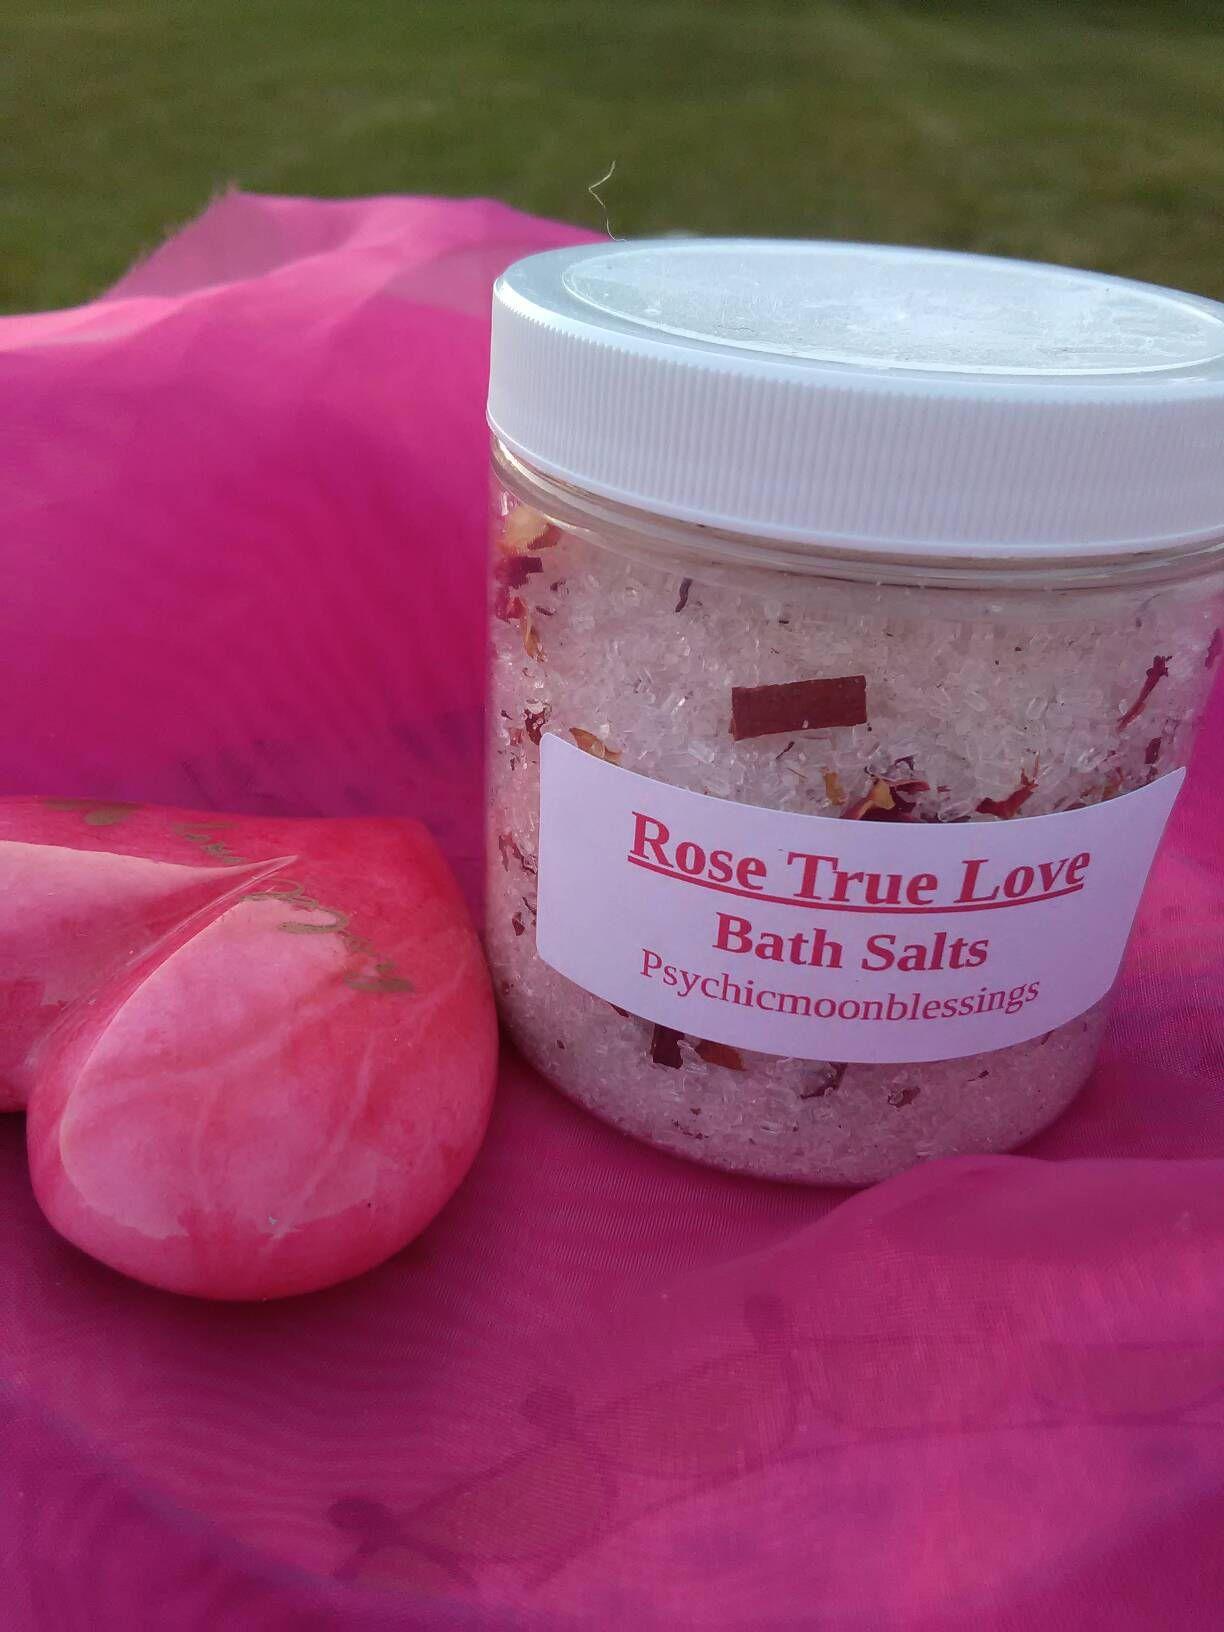 Rose True Love Bath Salts Wicca Hoodoo Santeria